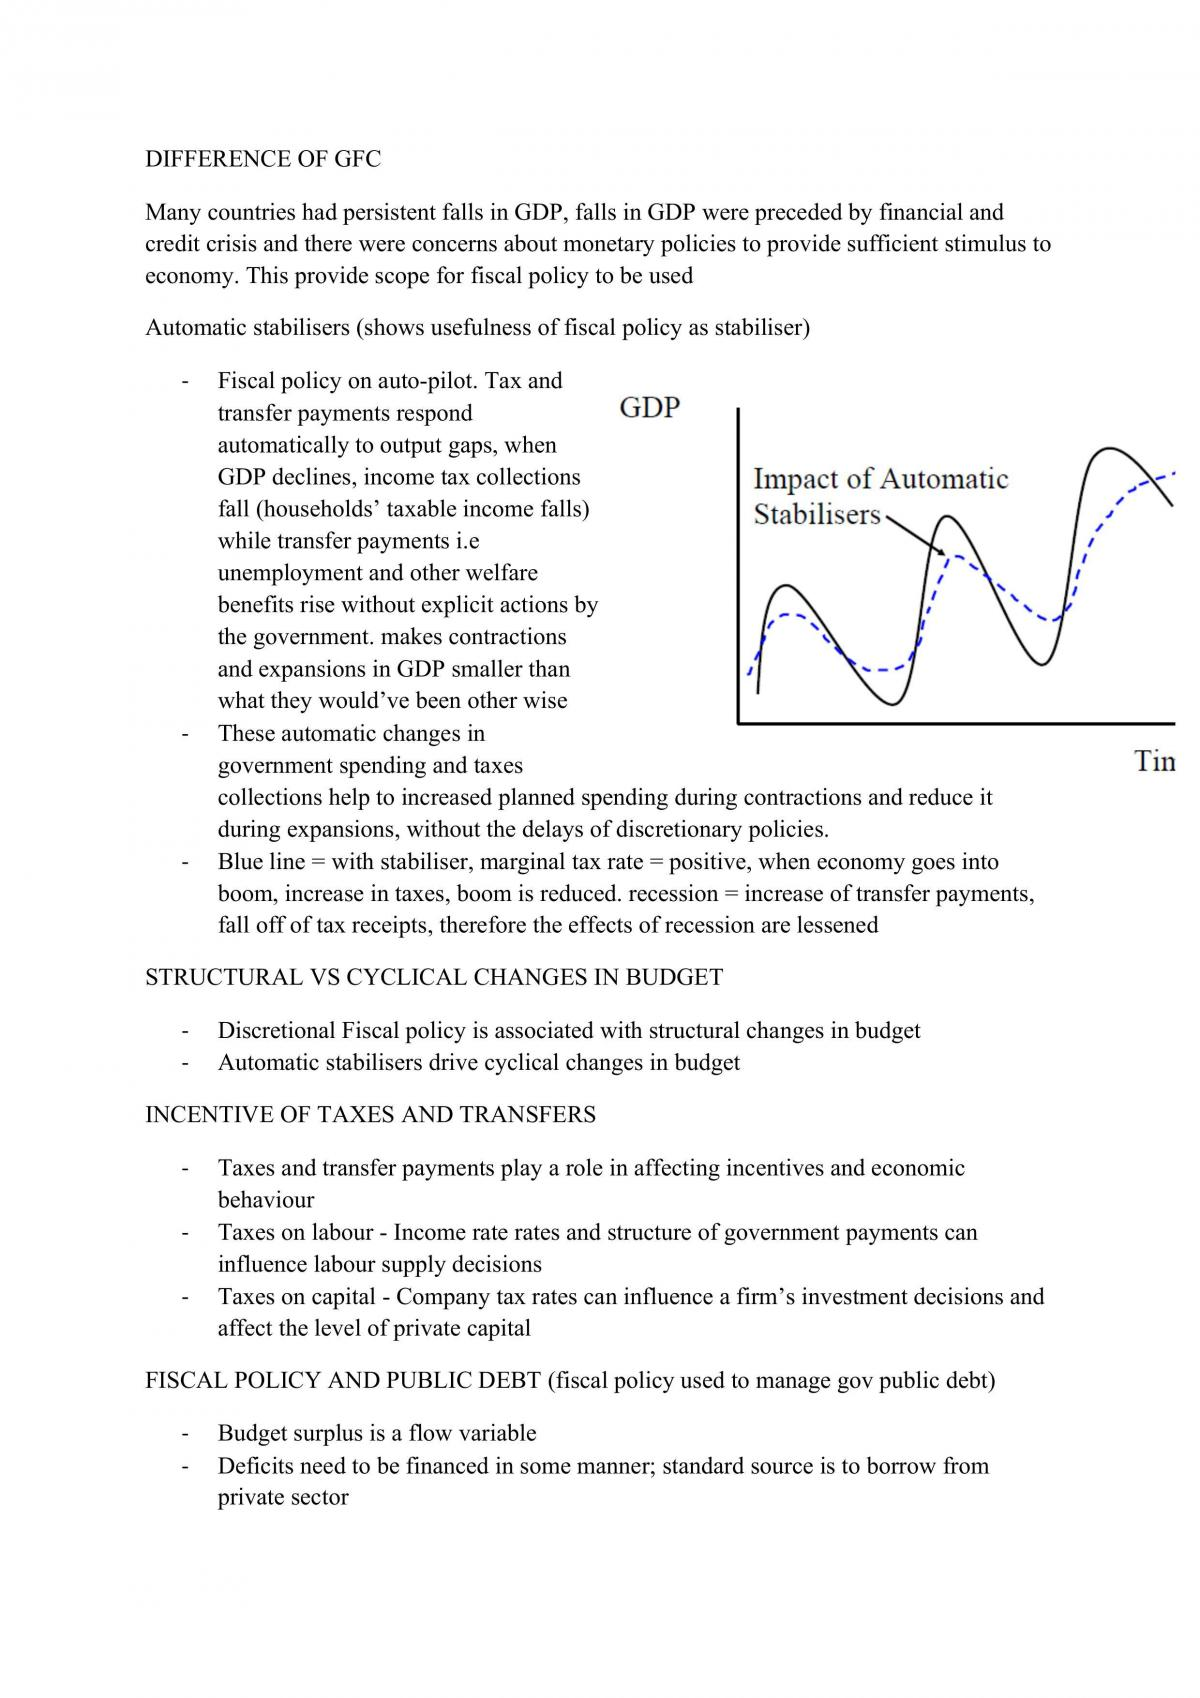 Macroeconomics Full Study Notes - Page 30